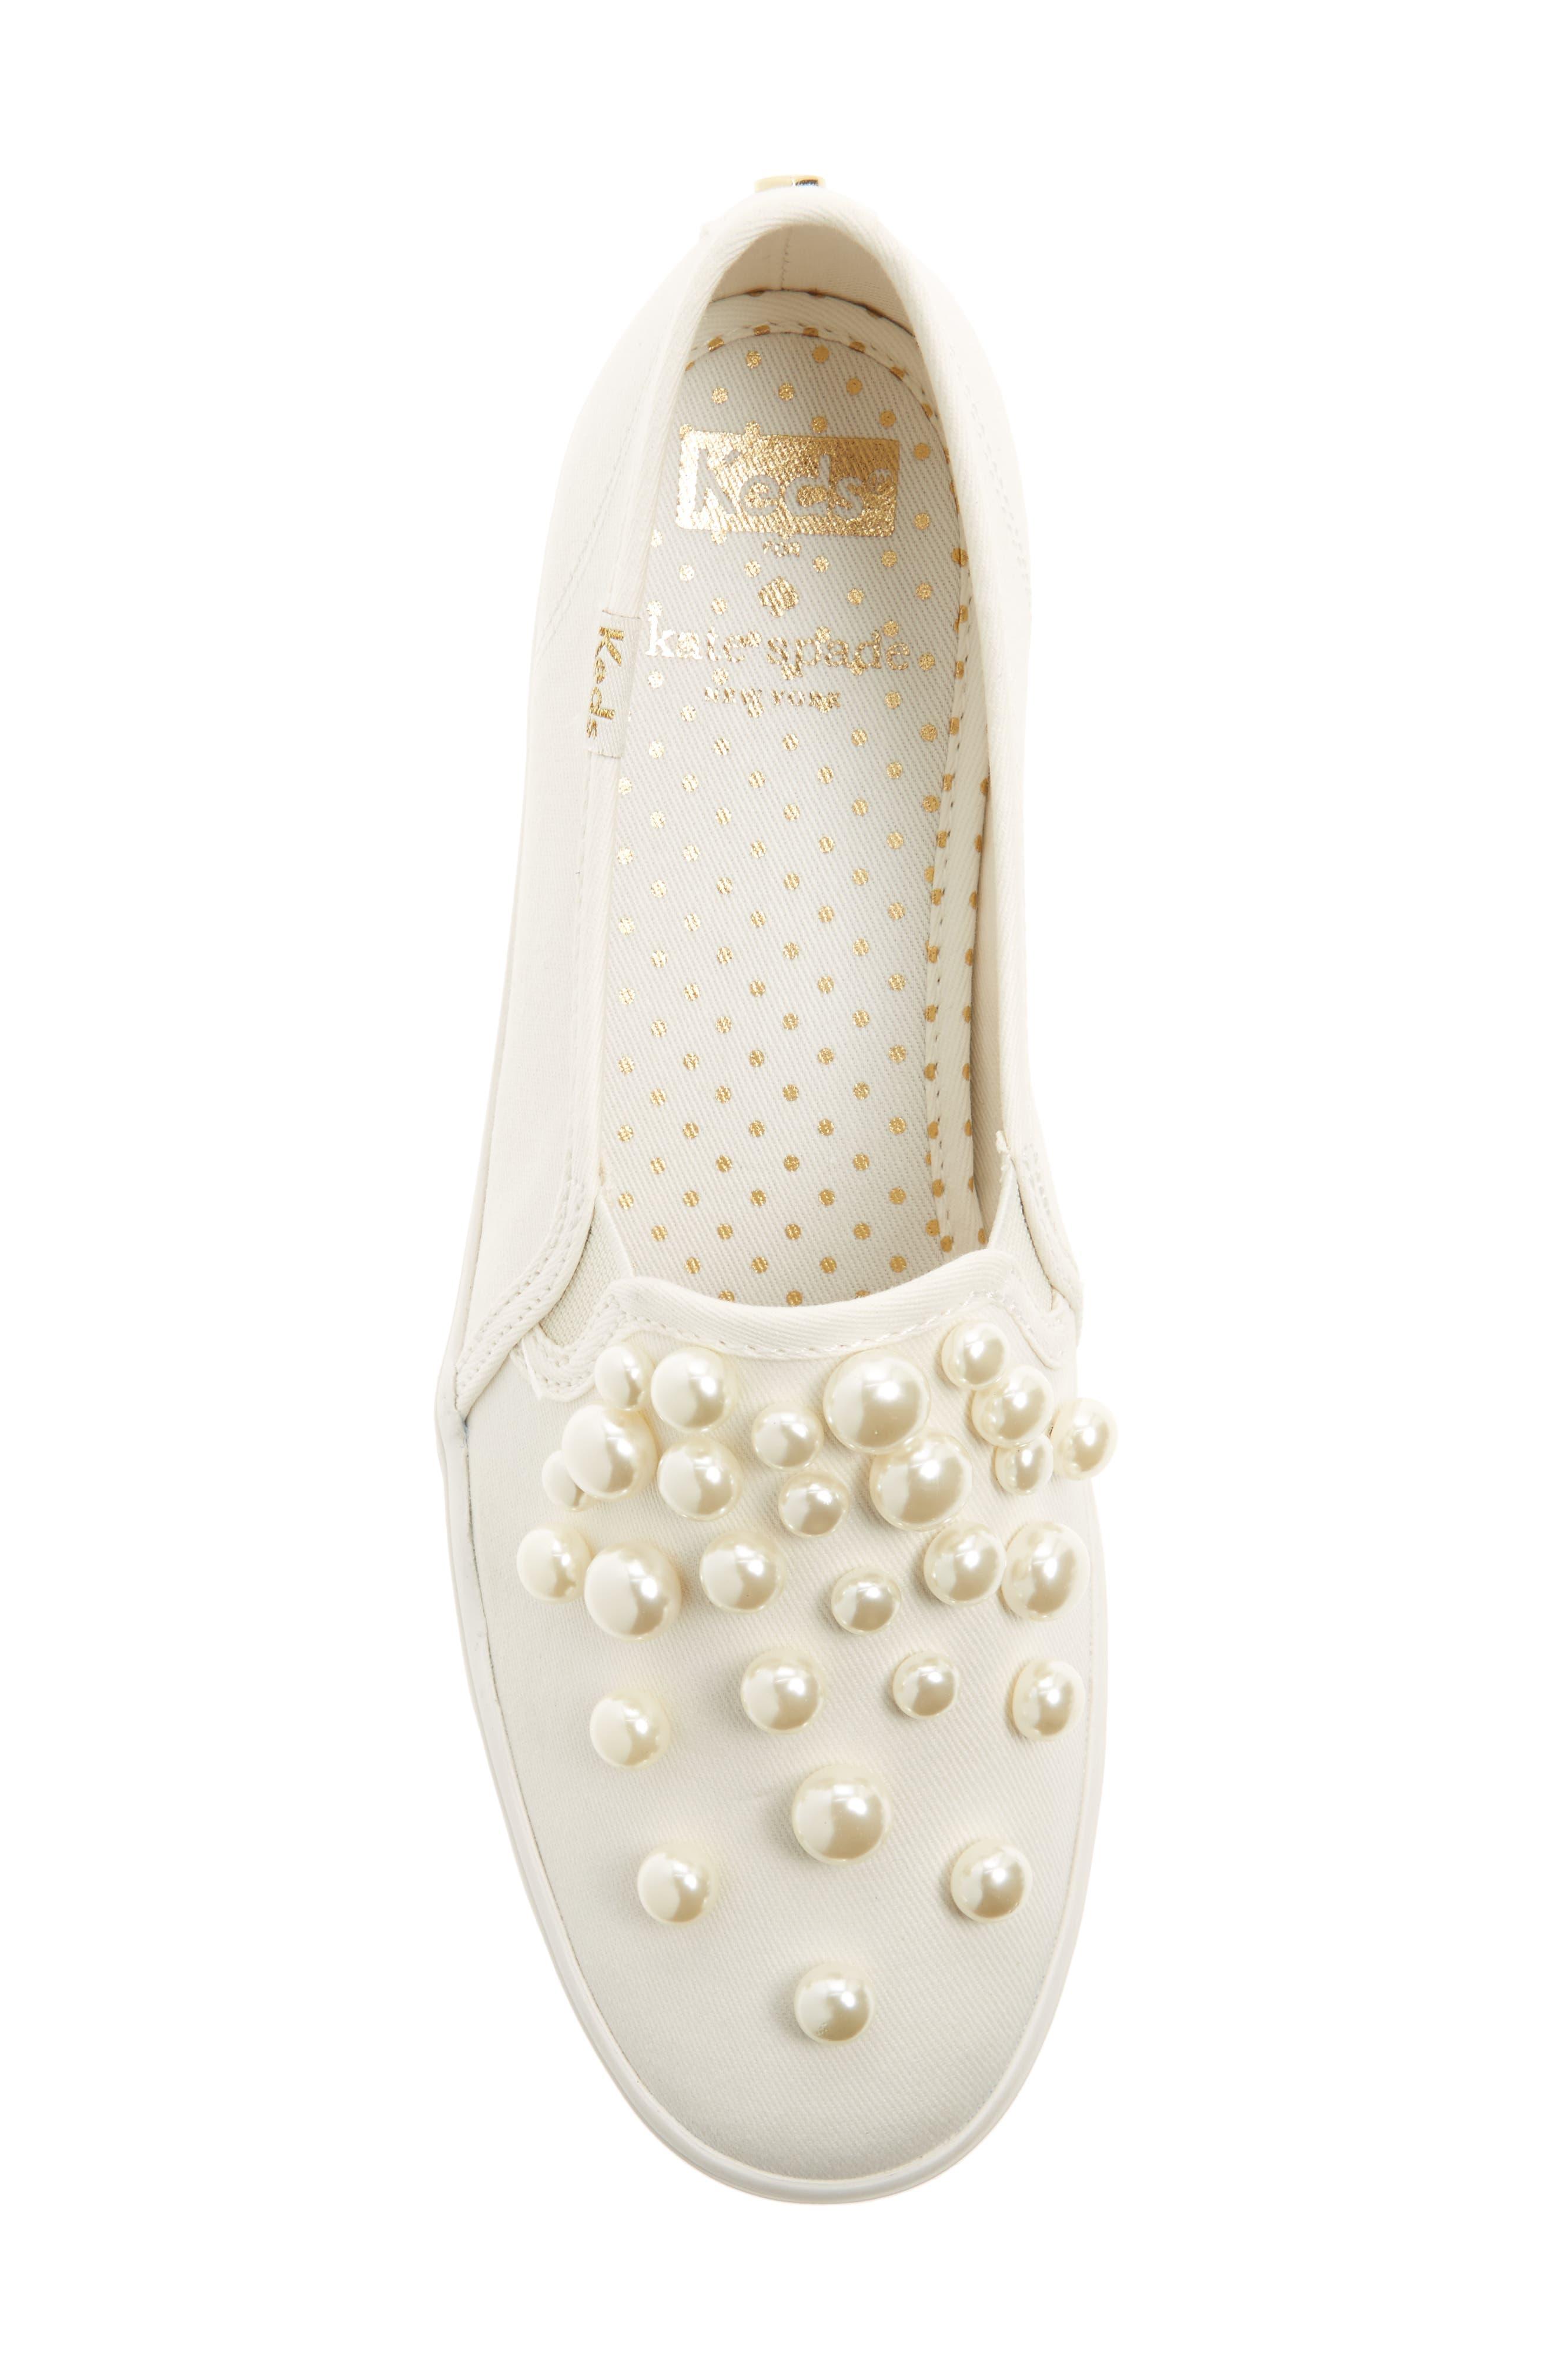 KEDS<SUP>®</SUP> FOR KATE SPADE NEW YORK, triple decker embellished slip-on sneaker, Alternate thumbnail 5, color, CREAM